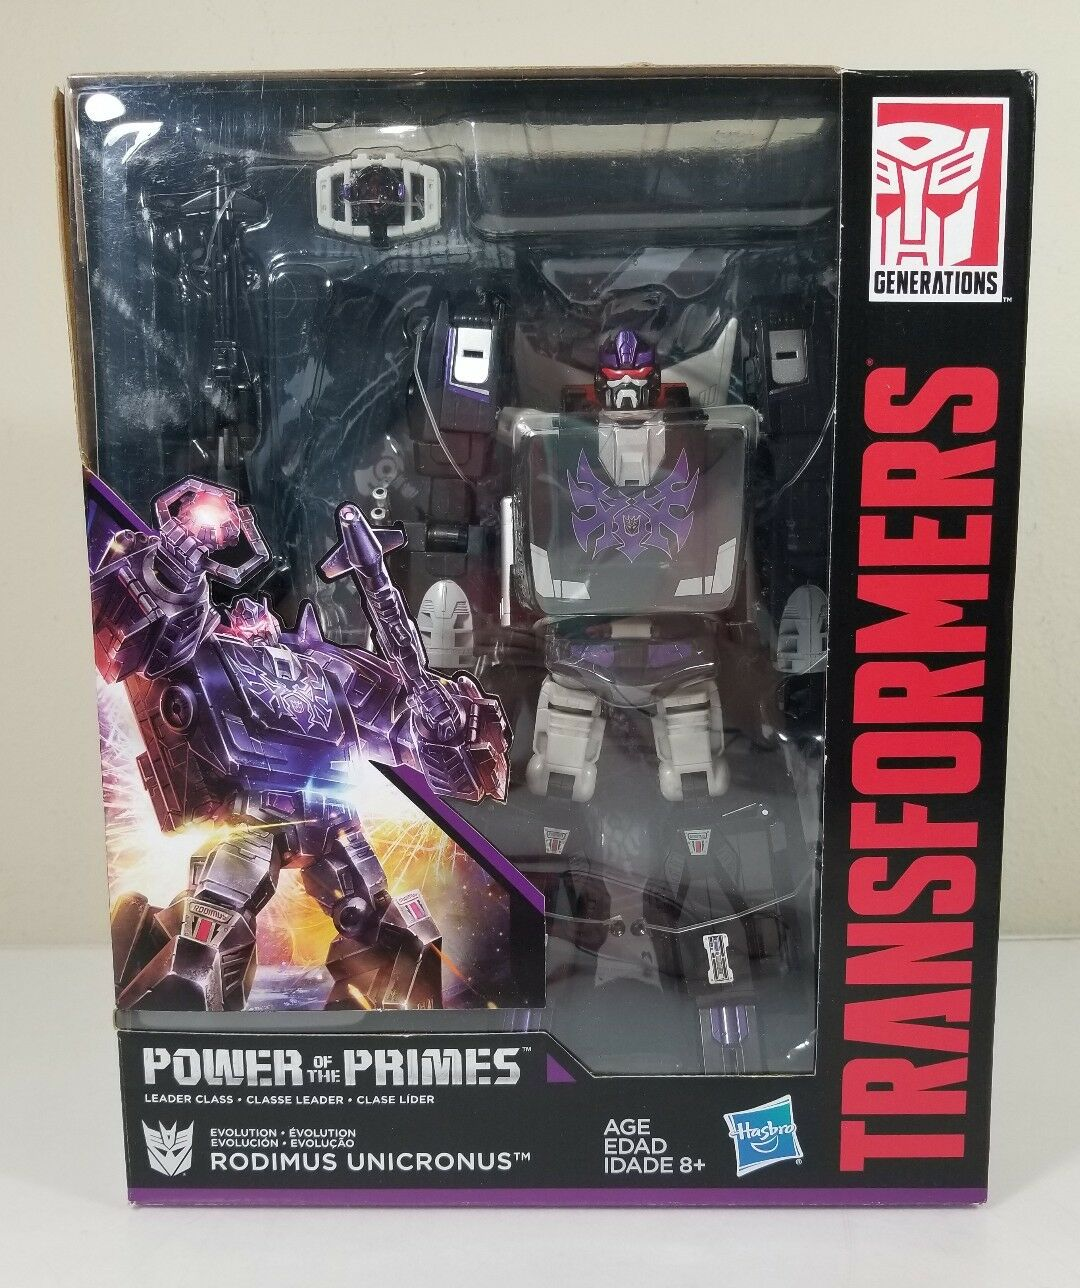 Rodimus unicronus Transformers energía de la clase clase clase líder modelo PRIMES 2018 NIH 8cf44c